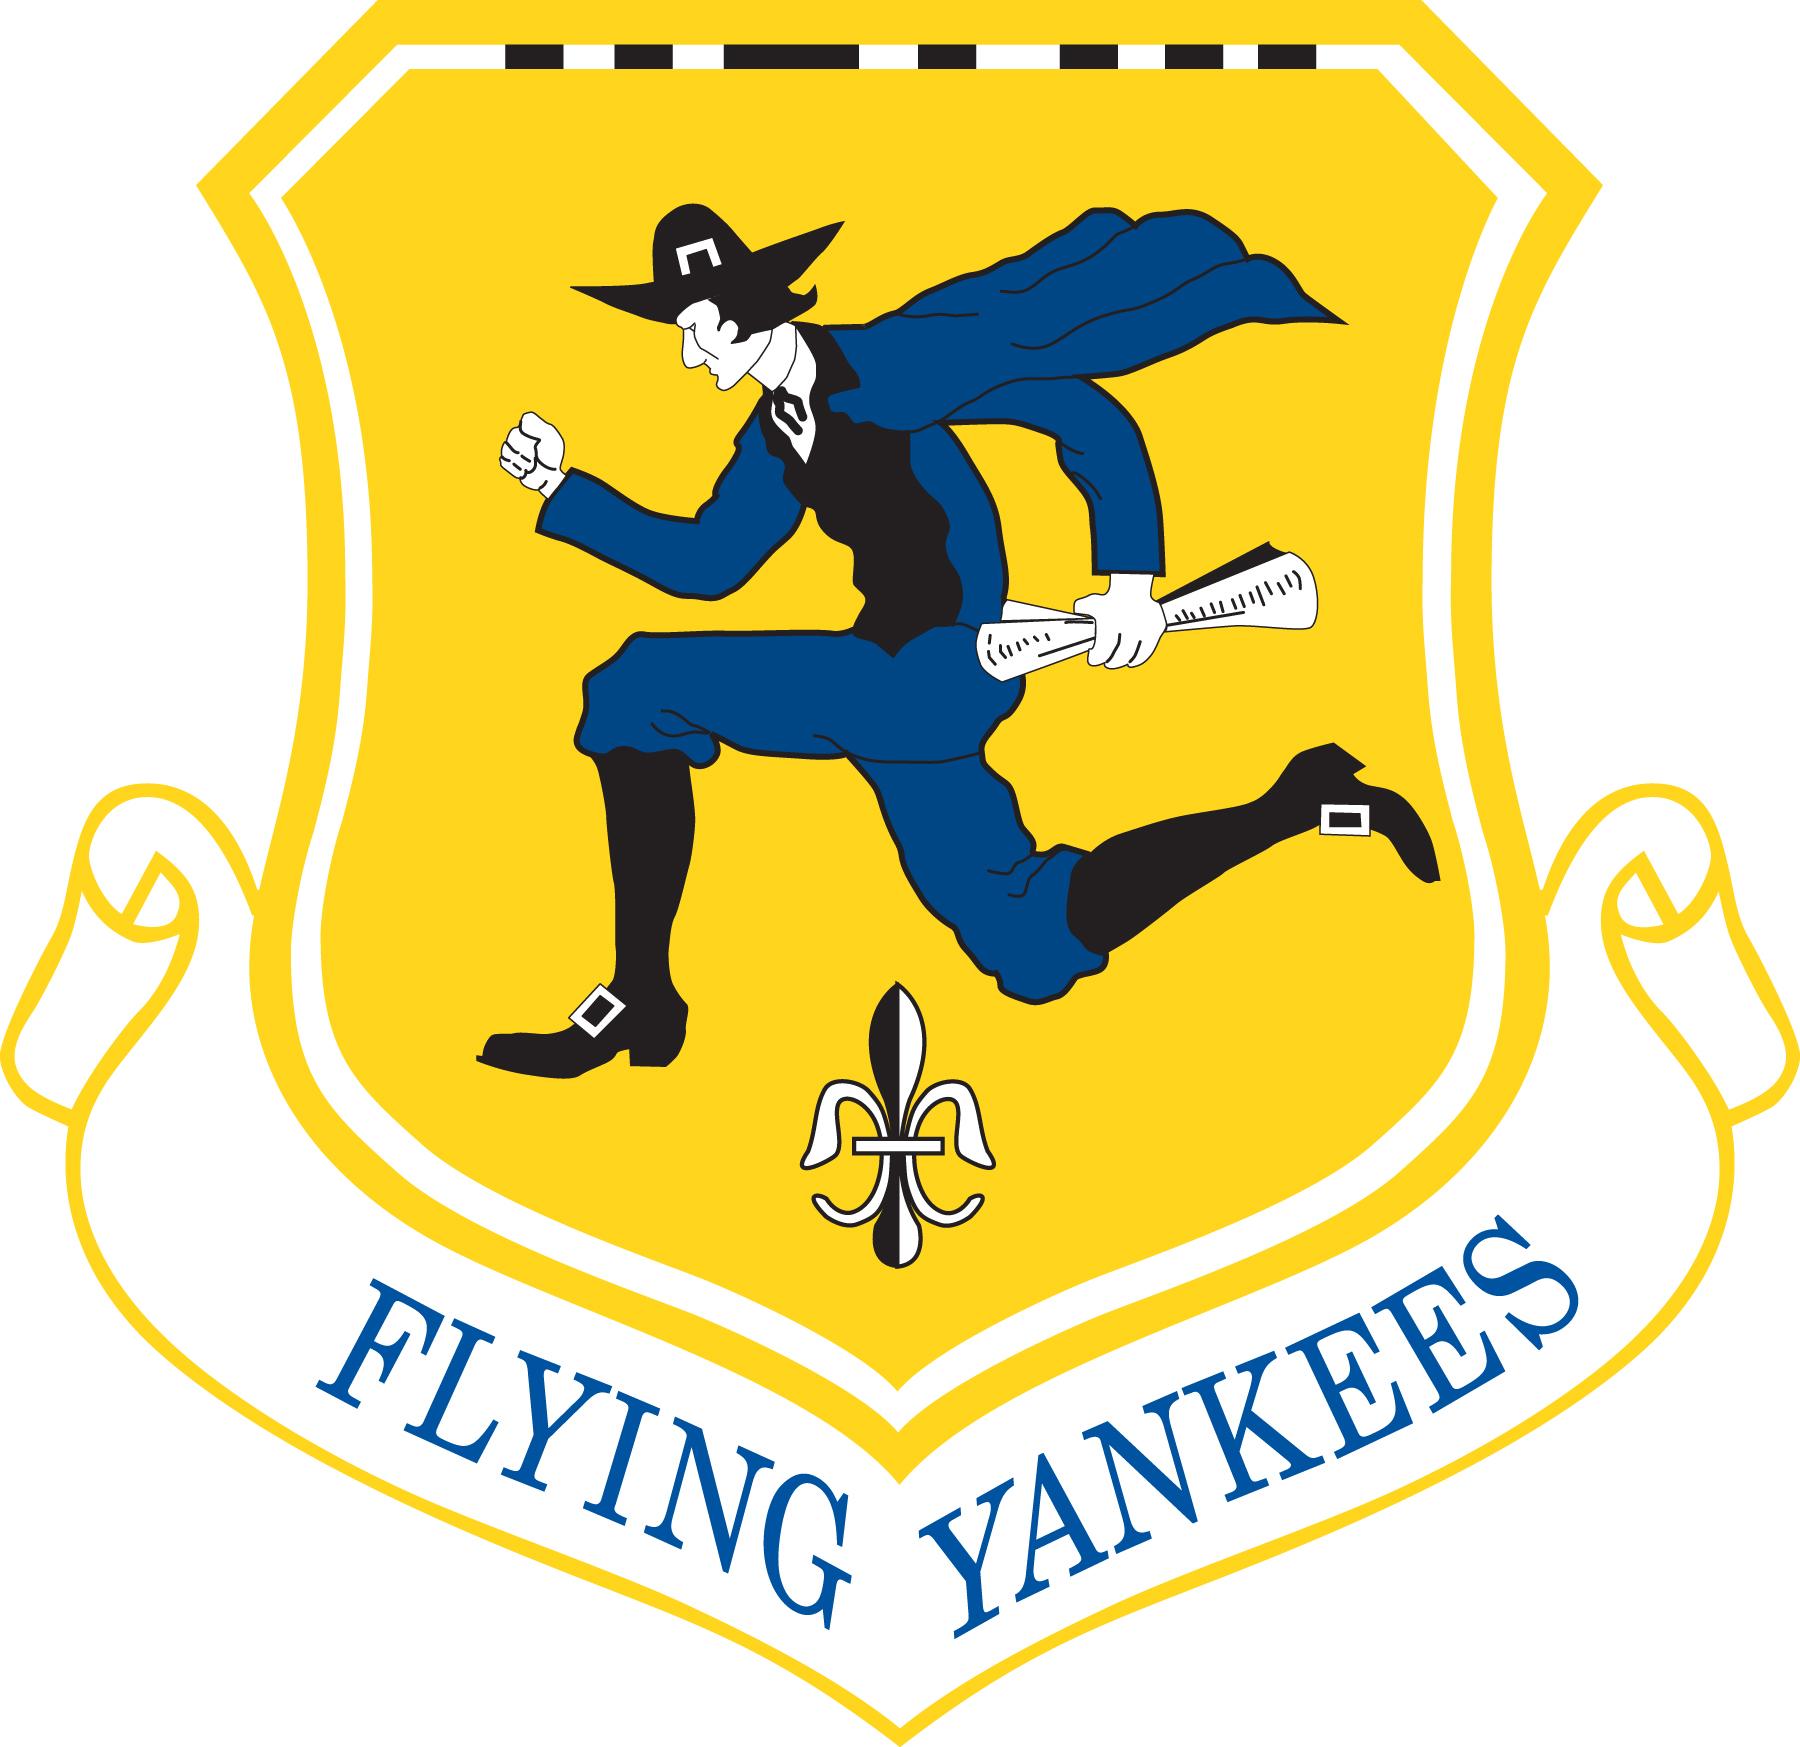 File:103d Flying Yankees.jpg - Wikimedia Commons